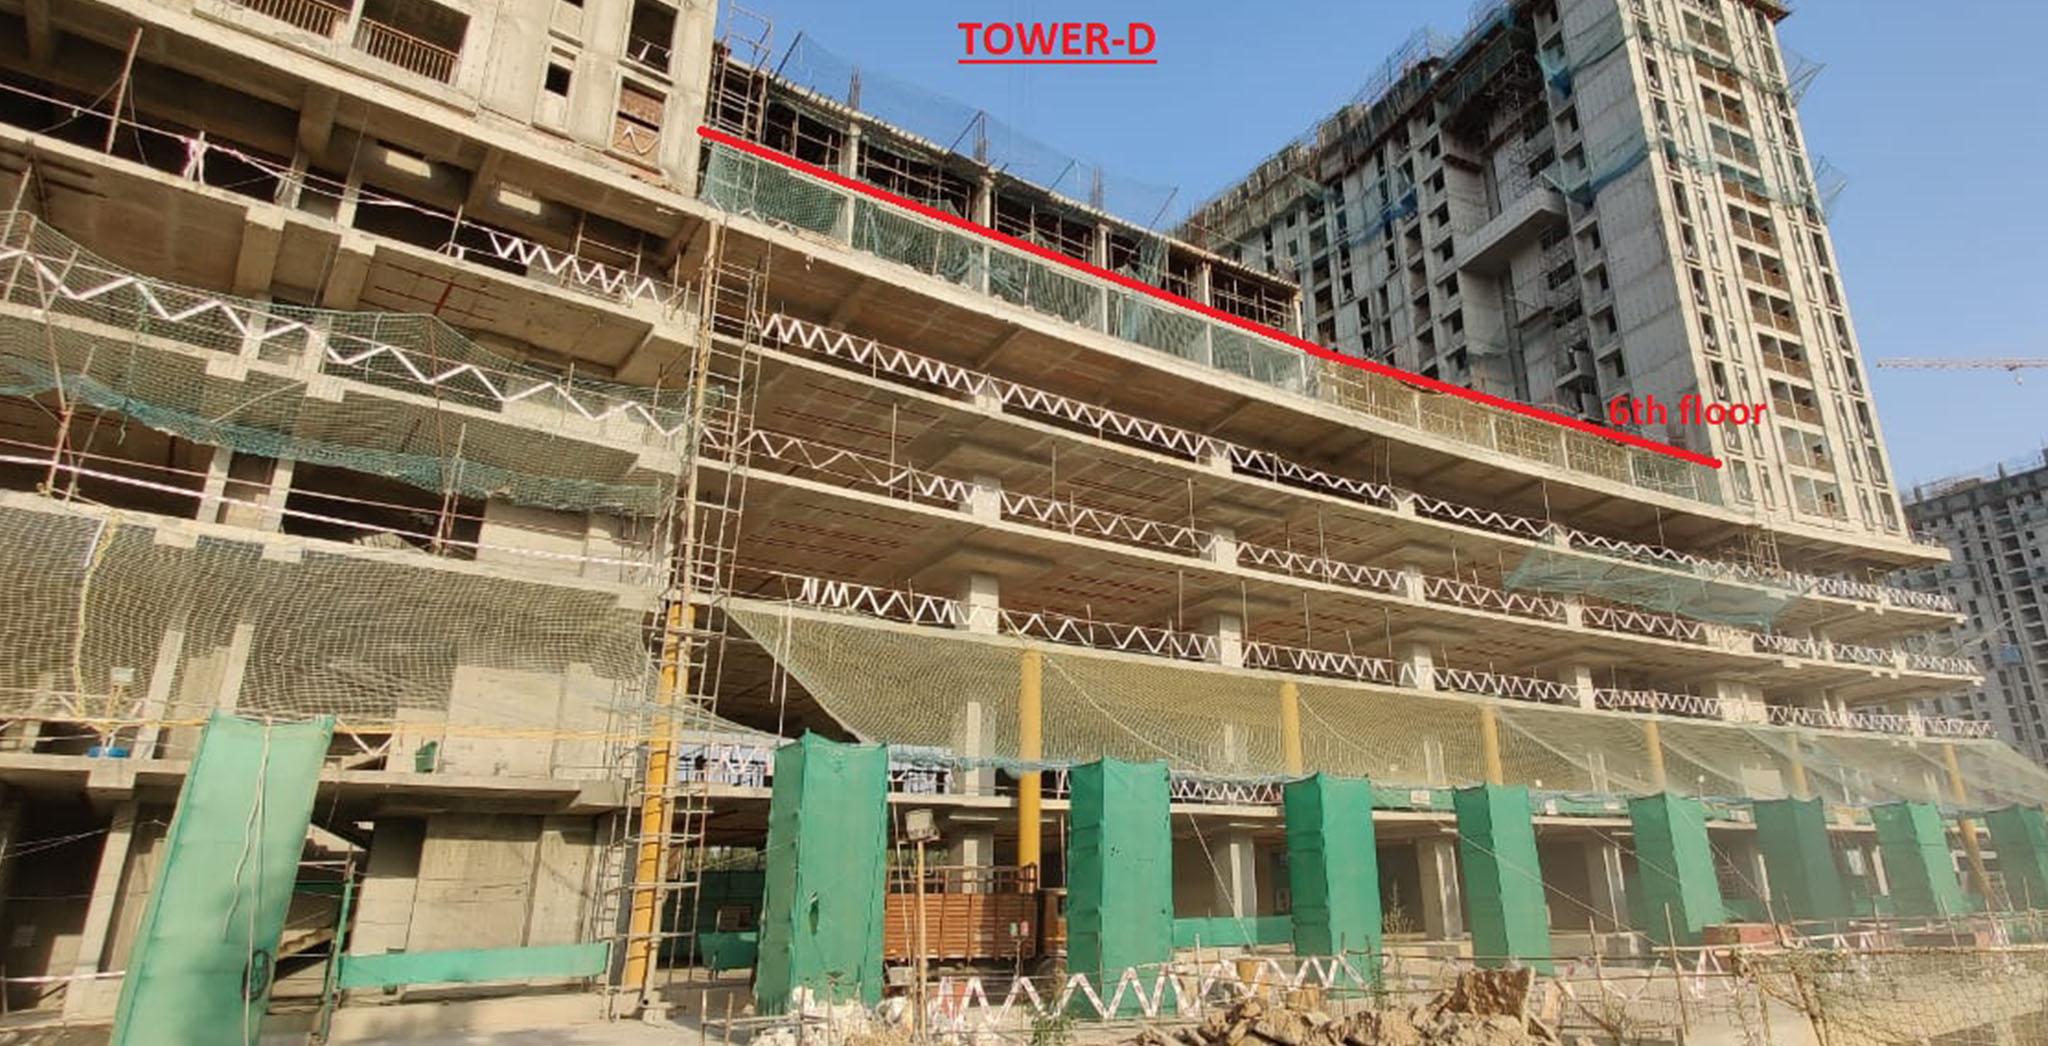 Apr 2021 - Eden: Tower D—On completion of sixth floor slab milestone, 3rd April 2021